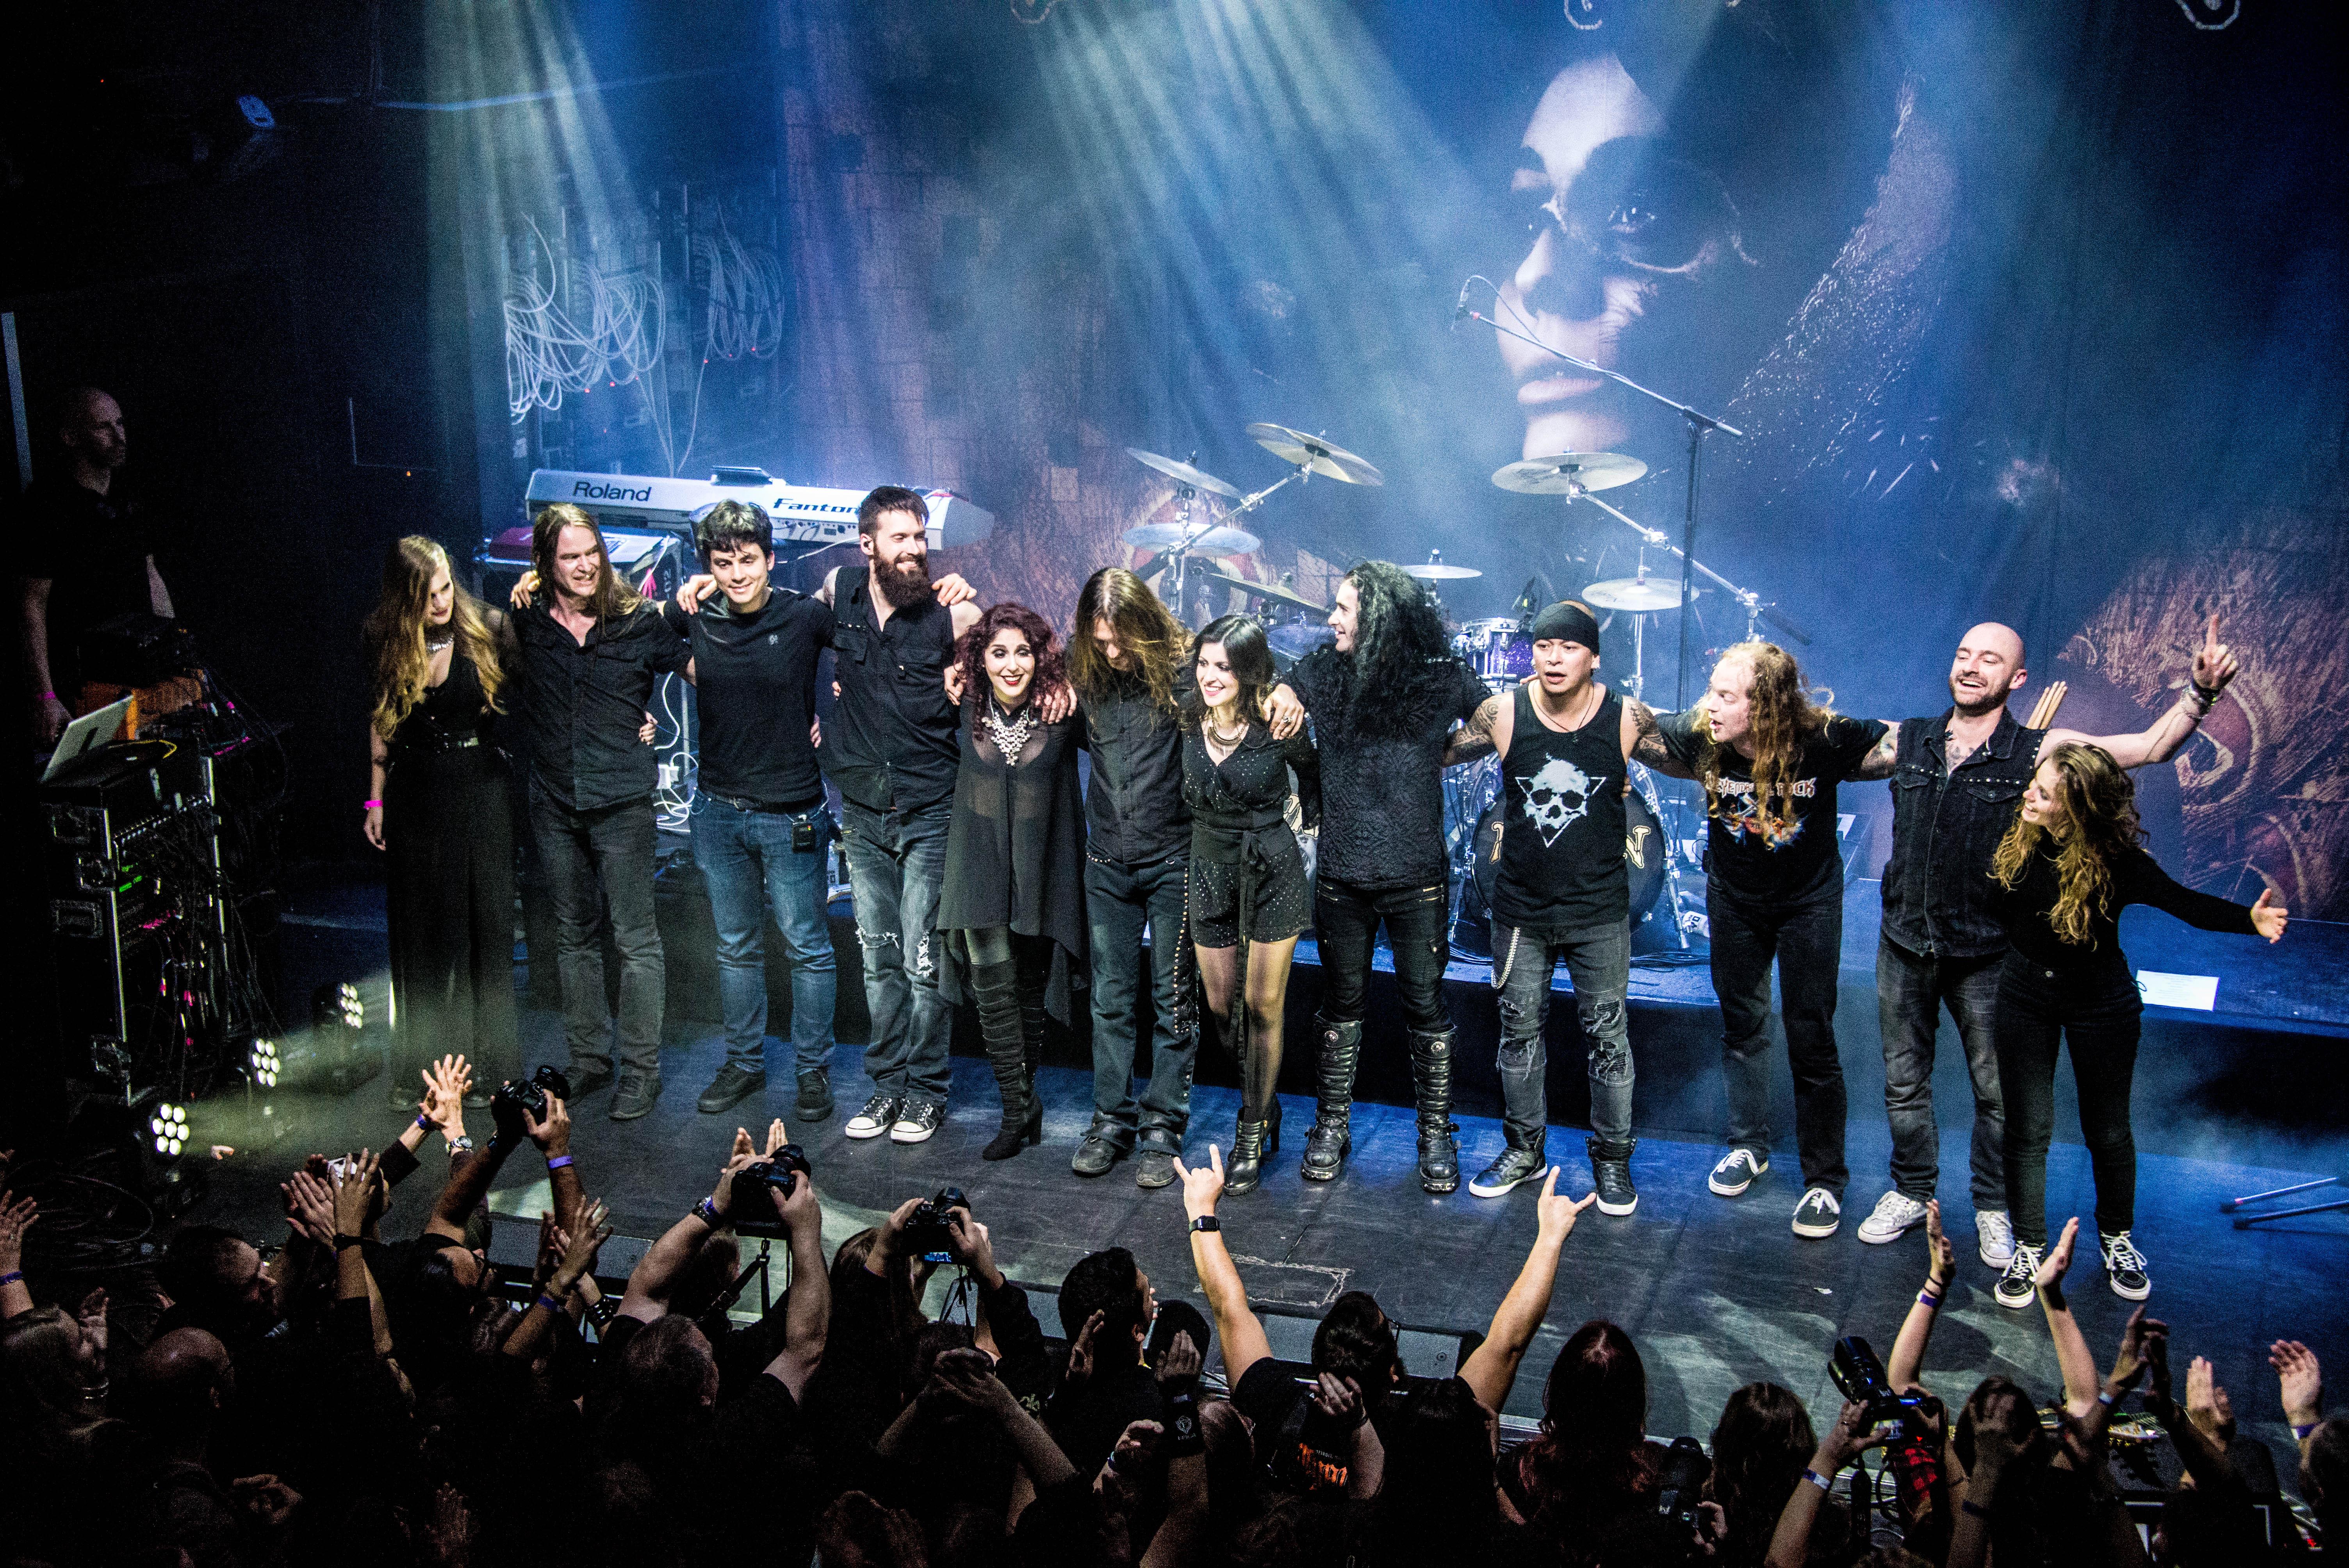 Mayan en concert à Eindhoven en 2019